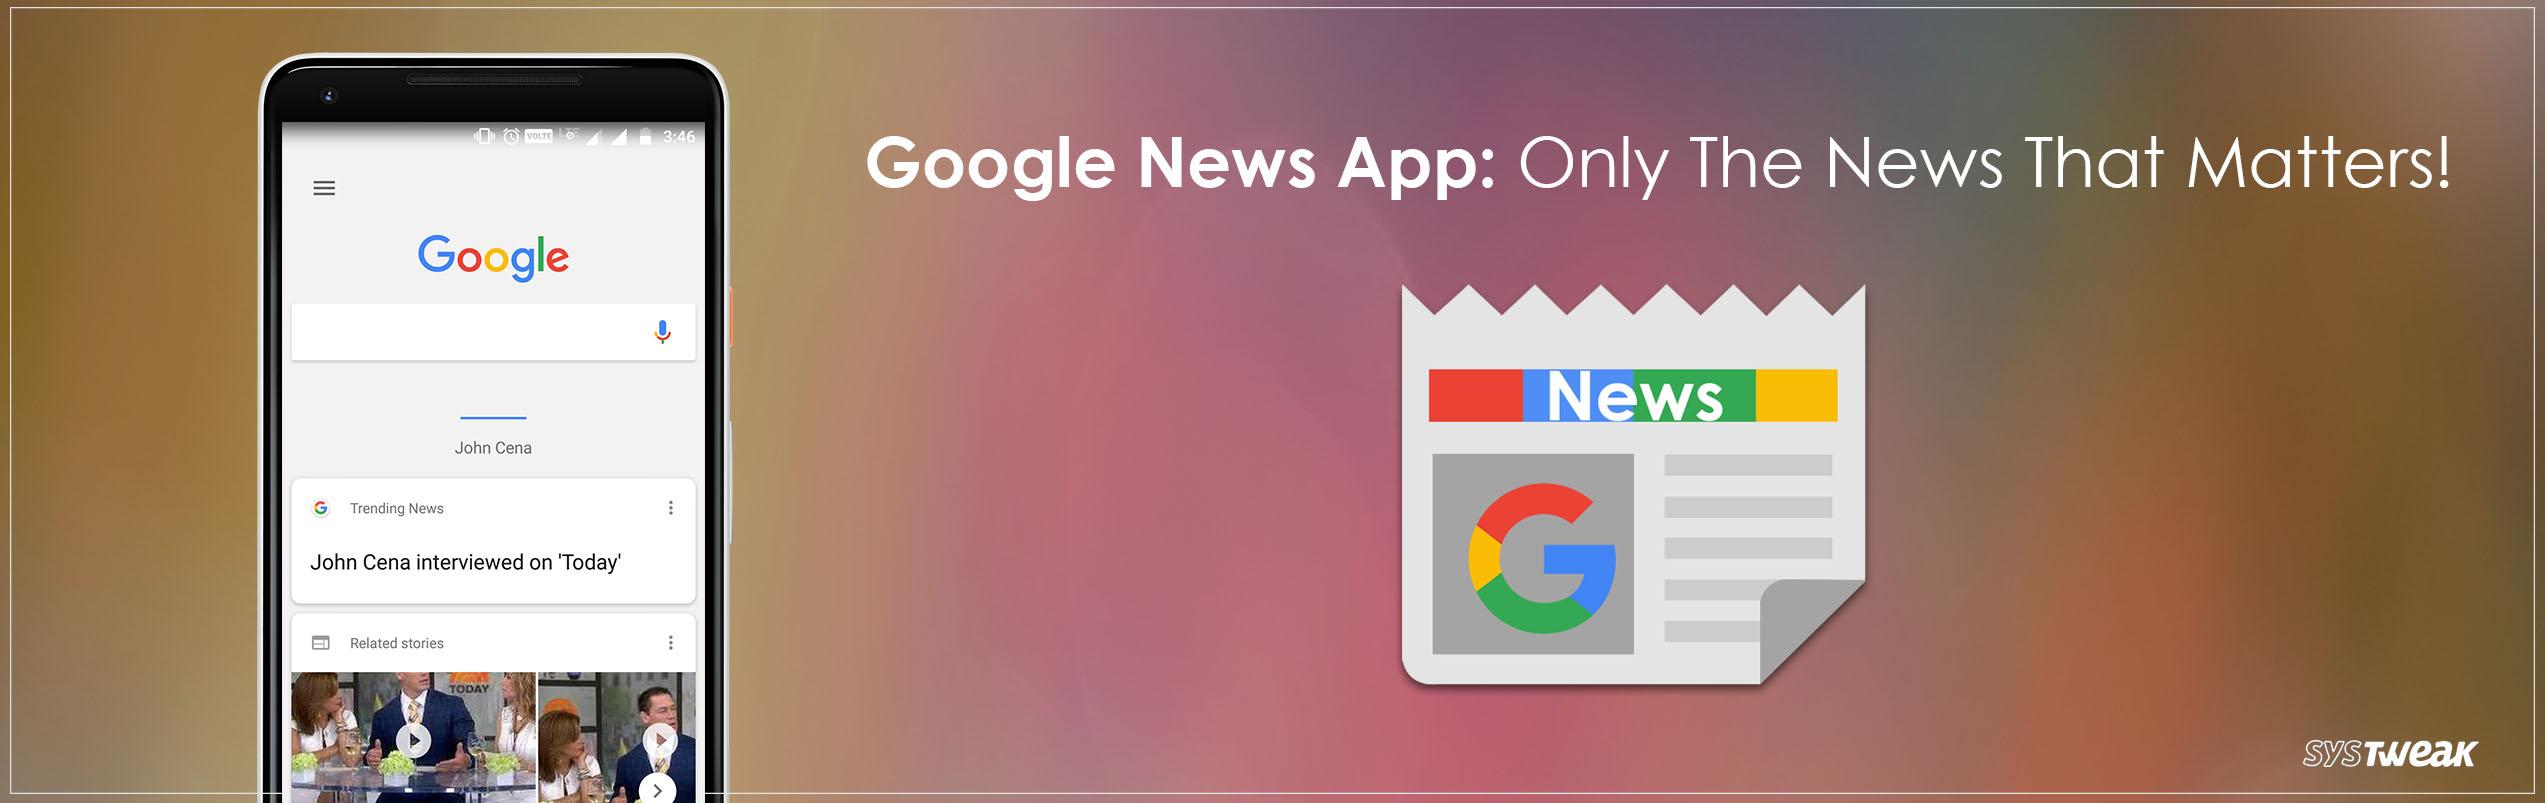 Say Hello To Google News App!